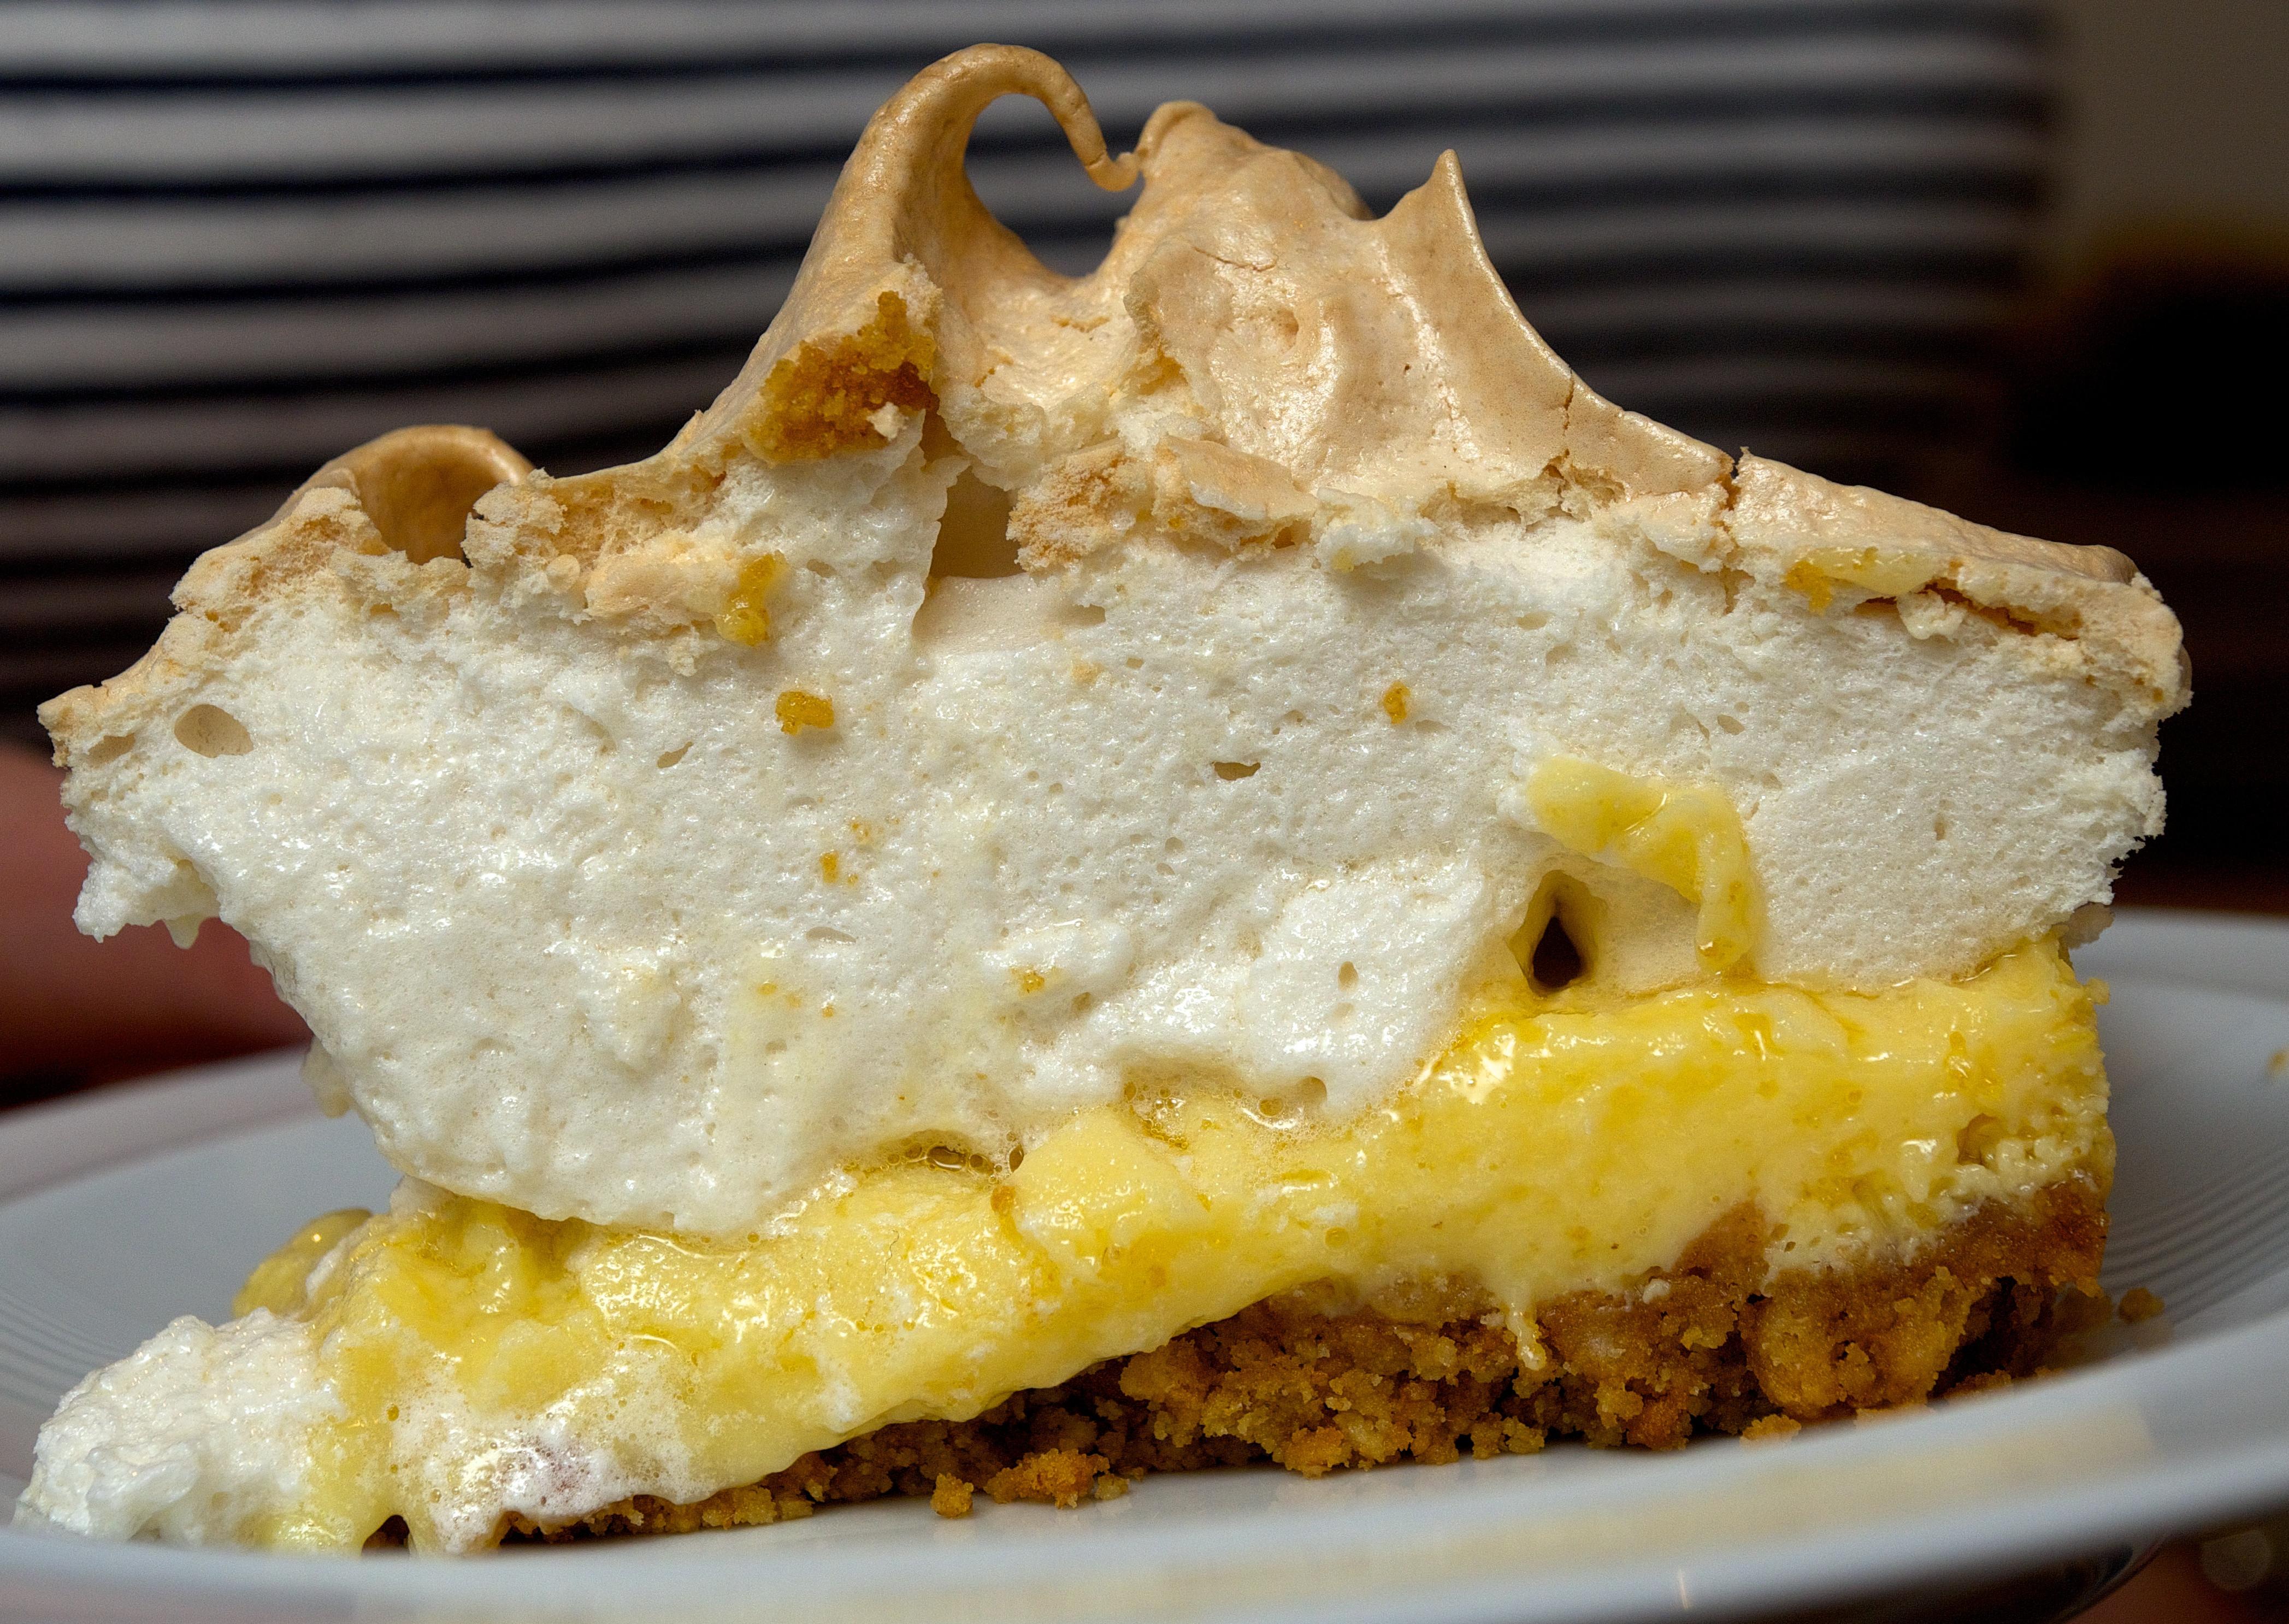 Homemade Lemon Meringue Pie  Easy Lemon Meringue Pie